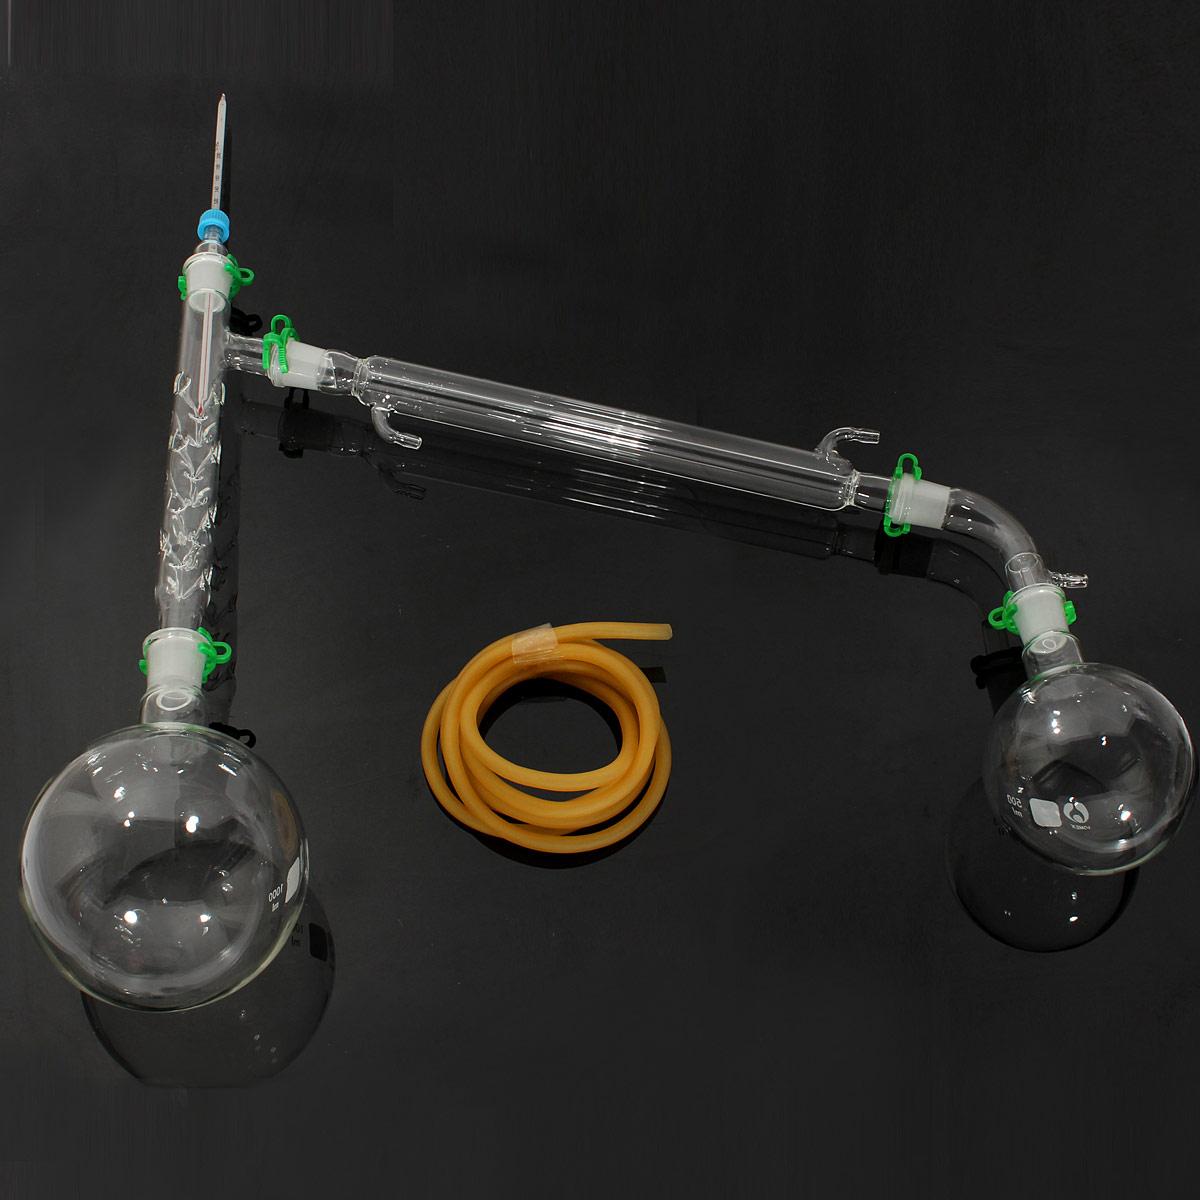 1000 ml appareil de Distillation laboratoire chimie verrerie Kit ensemble chimie laboratoire verre Distillation appareil de Distillation 24/29